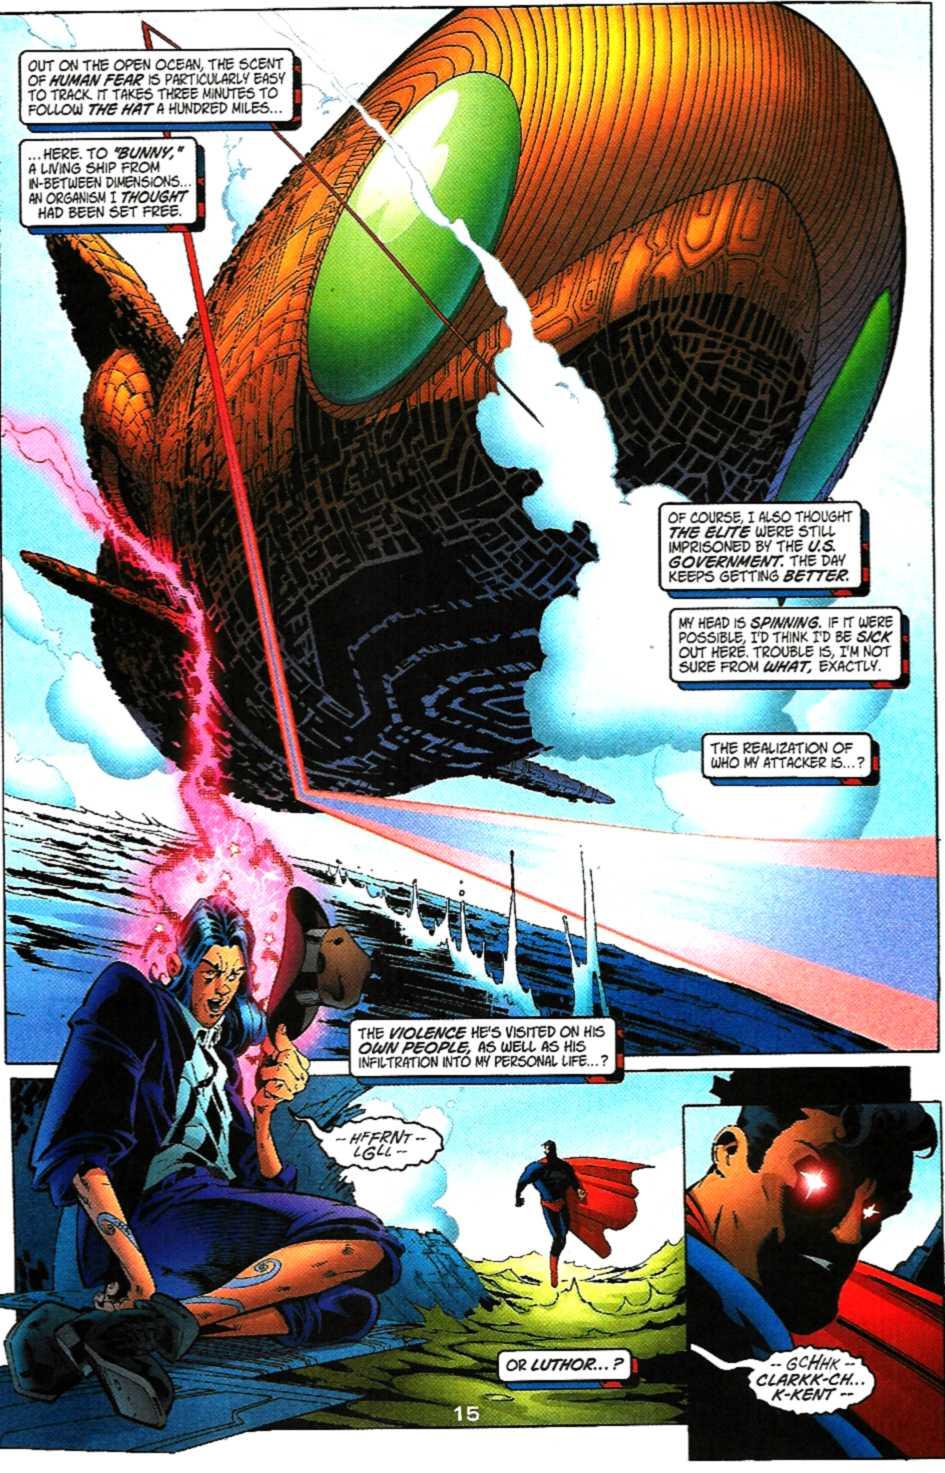 Action Comics (1938) 795 Page 15